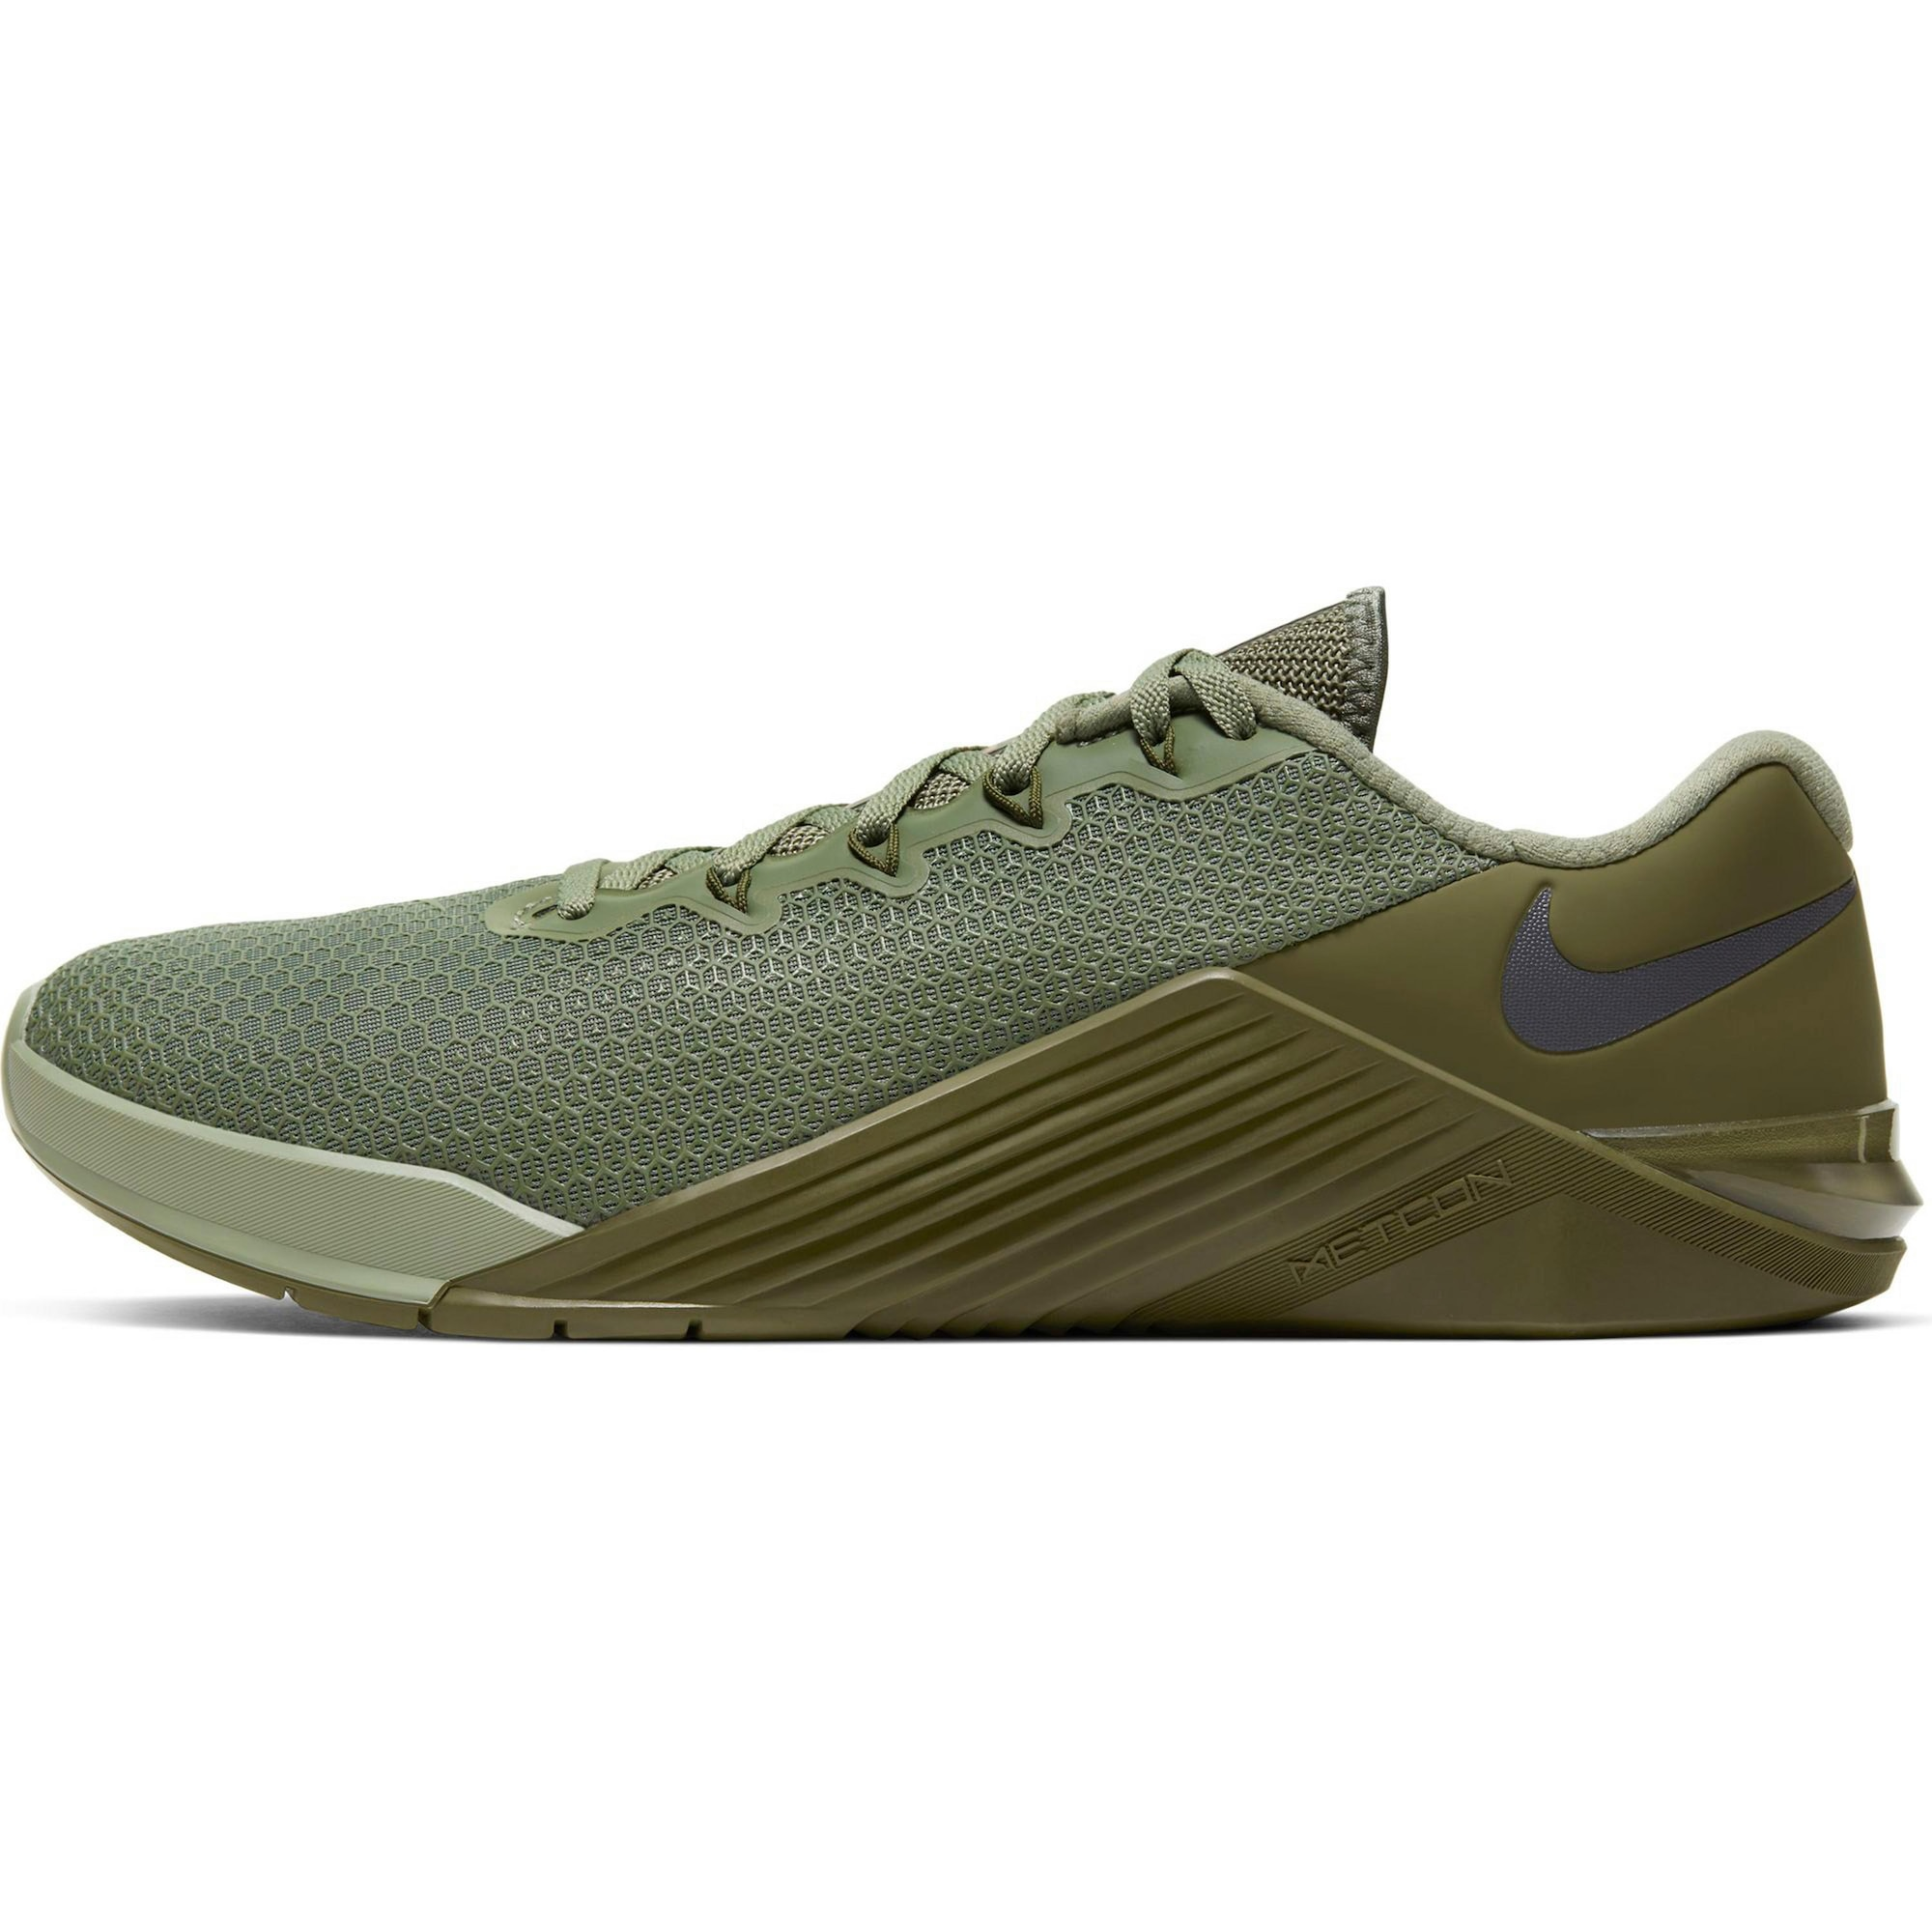 Fitnessschuh 'Metcon 5'   Schuhe > Sportschuhe > Fitnessschuhe   Nike